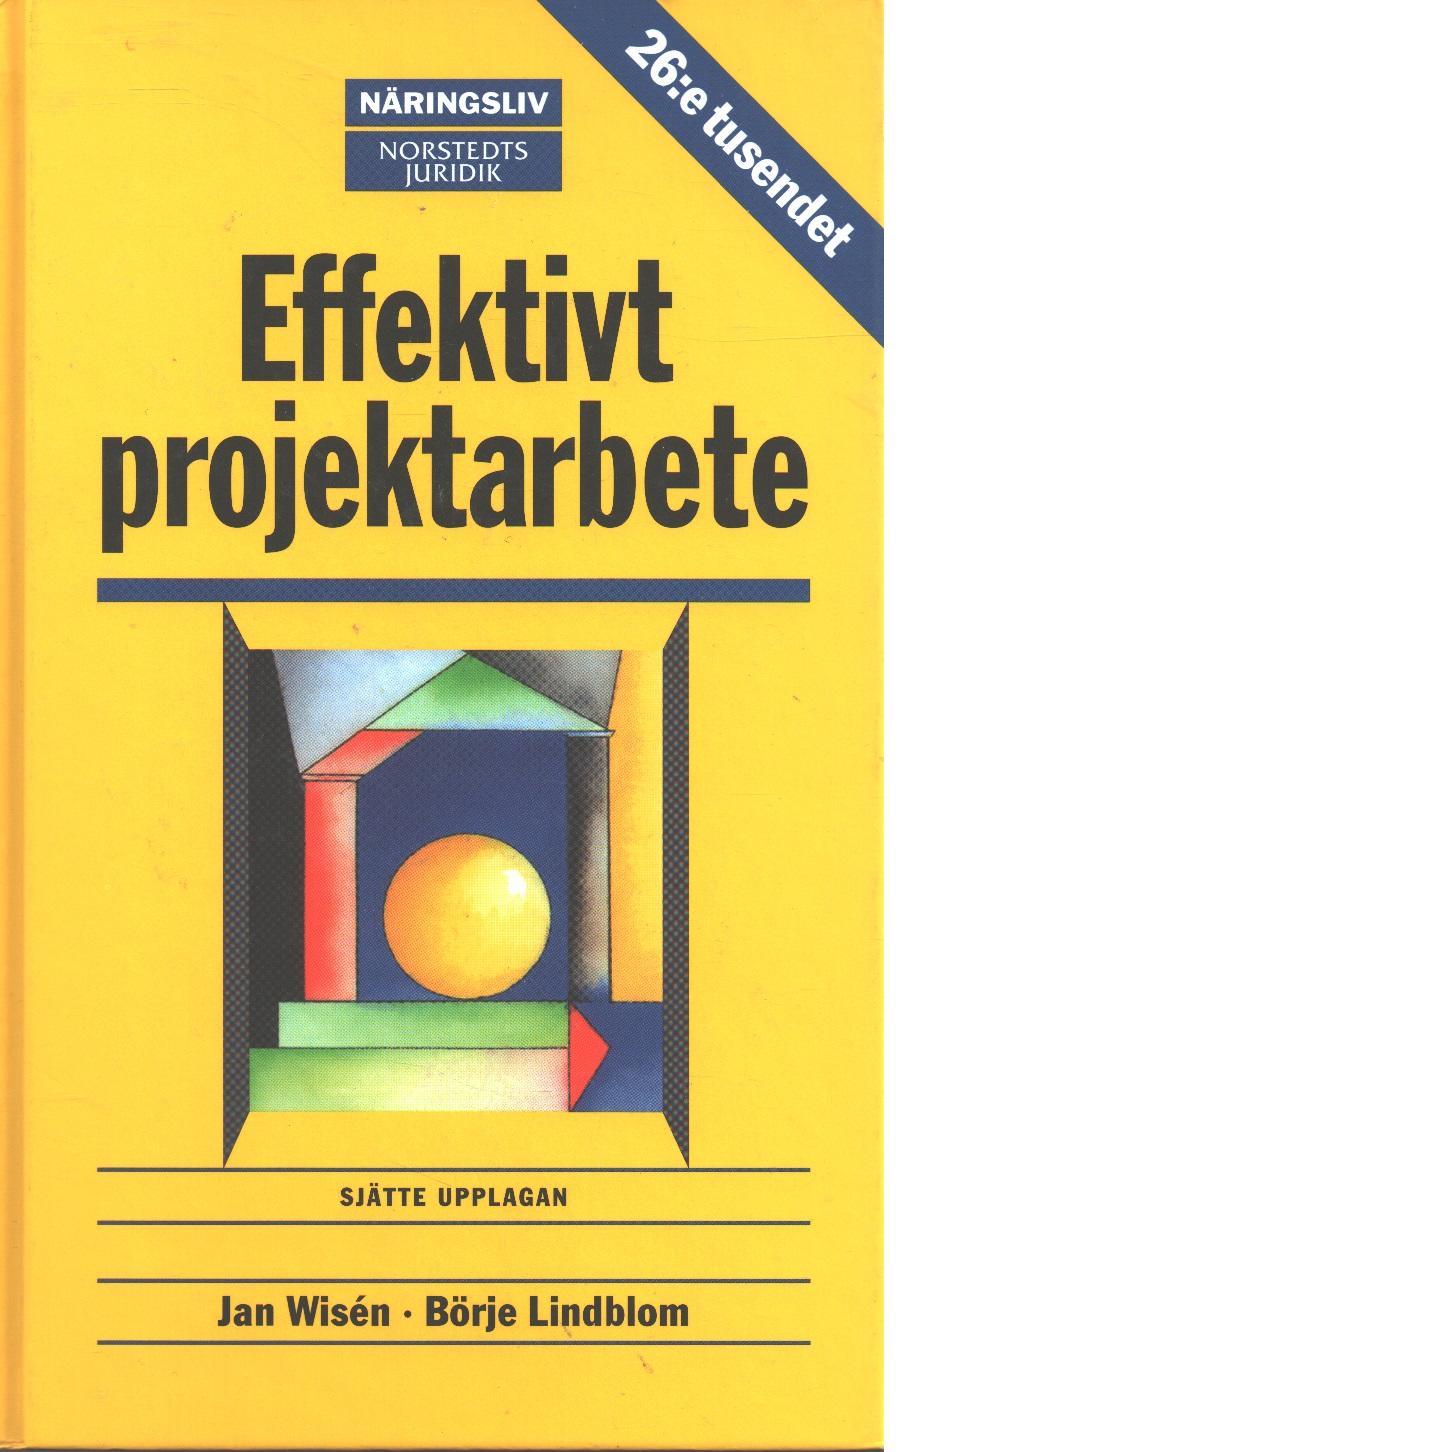 Effektivt projektarbete - Wisén, Jan och Lindblom, Börje